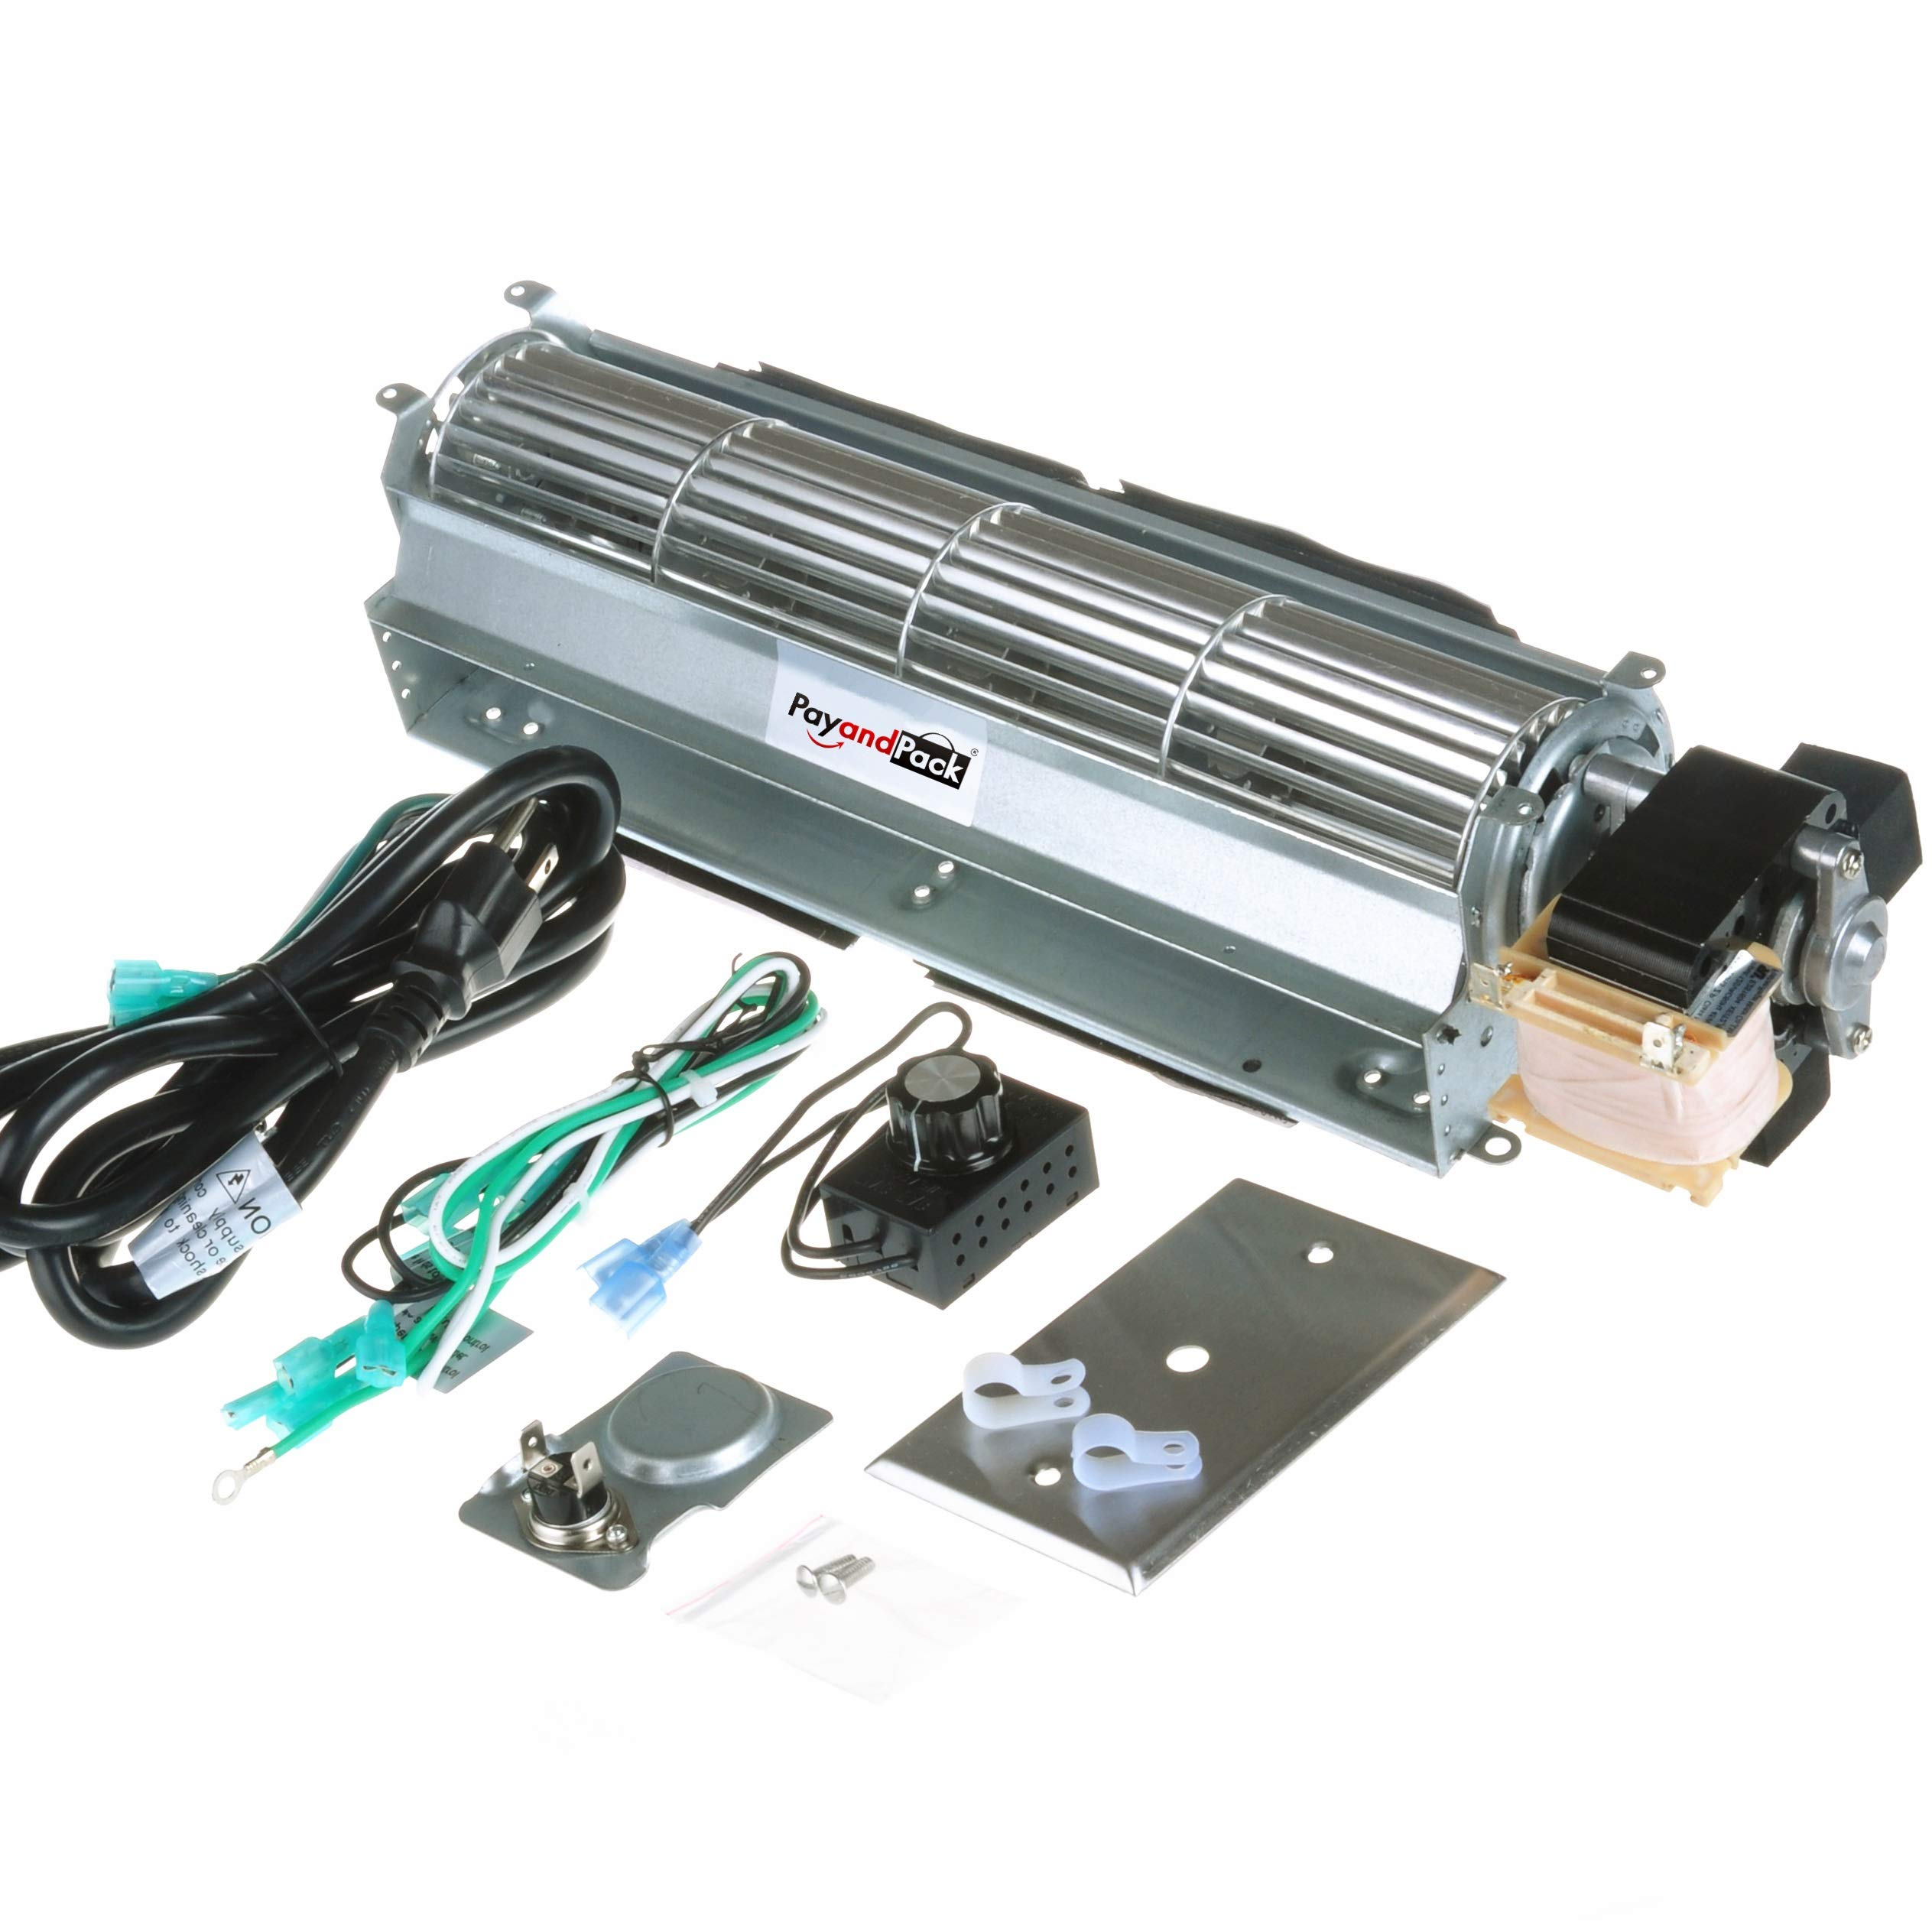 Durablow BK BKT GA3650 GA3700 GA3750 Replacment Fireplace Blower Fan Unit for Desa, FMI, Vanguard, Vexar, Comfort Flame Glow, Rotom ... (MFB010-B) by Durablow